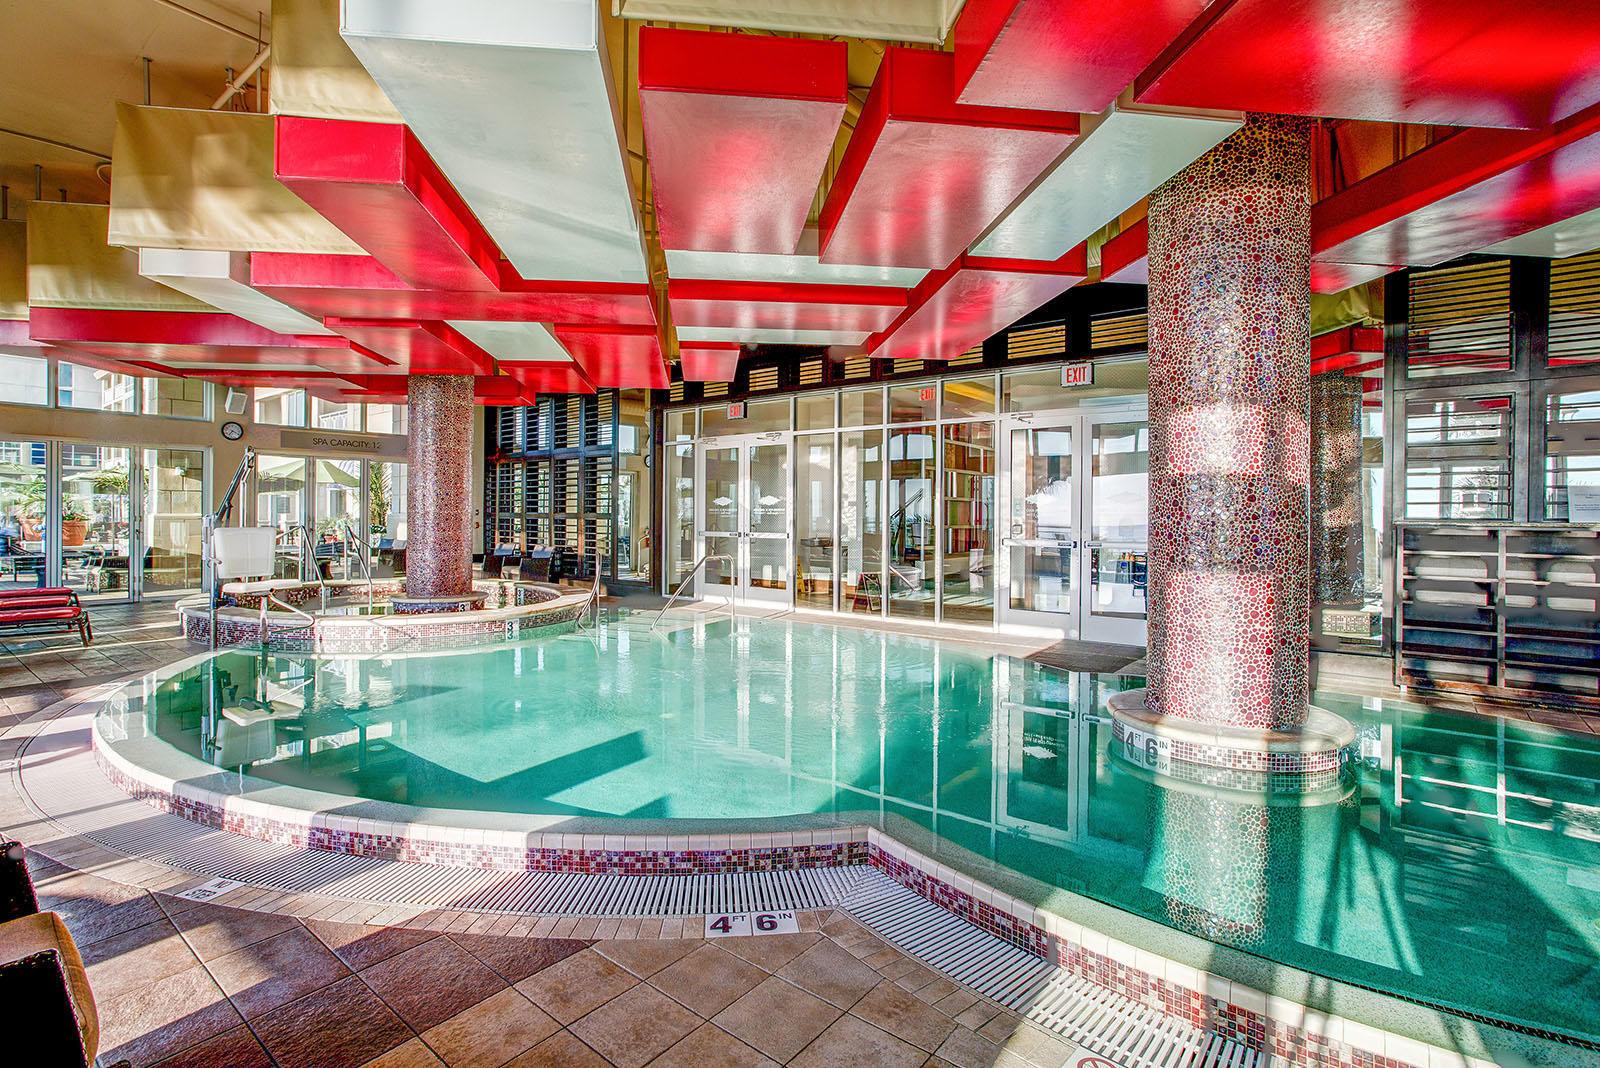 oceanaire resort virginia oceanfront hotels. Black Bedroom Furniture Sets. Home Design Ideas